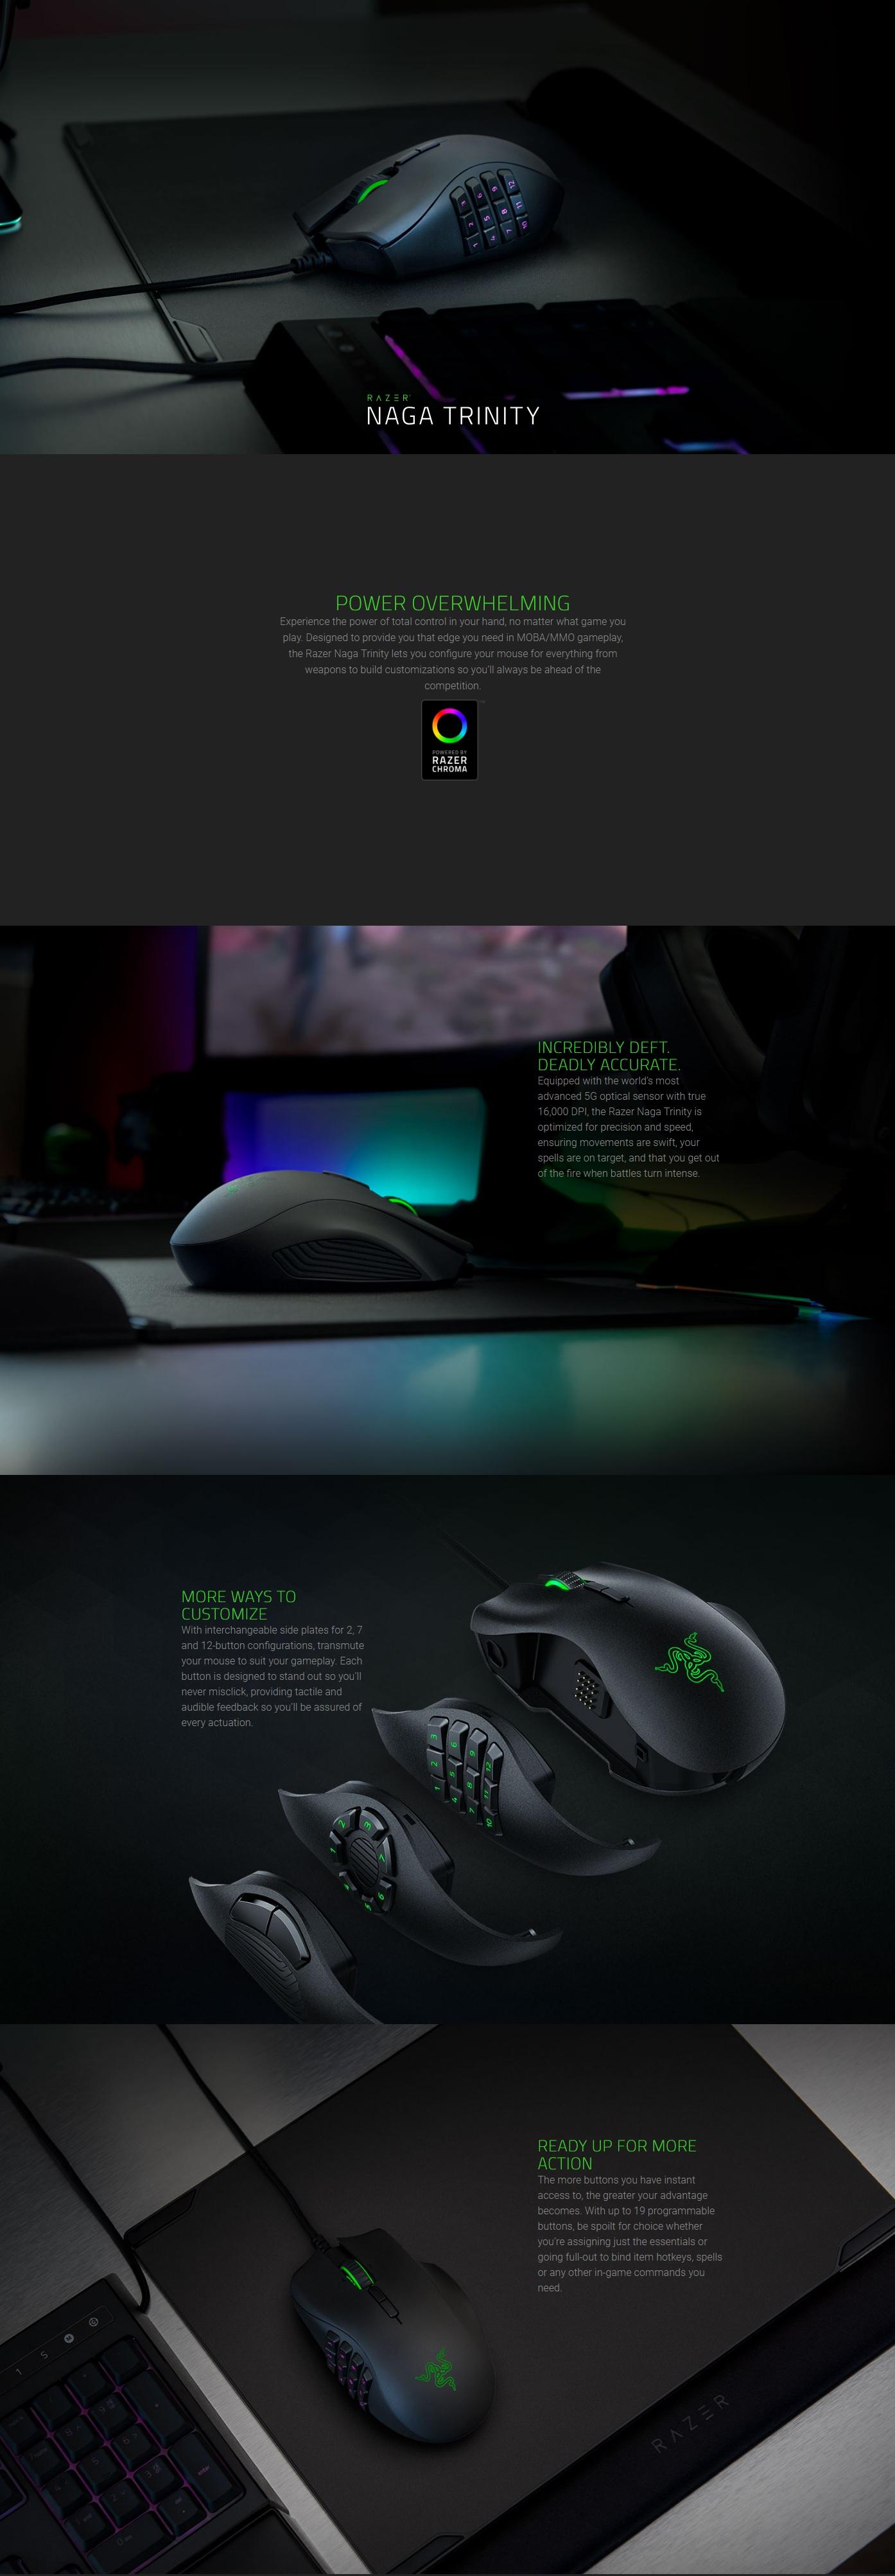 Razer Naga Trinity Multicolor MMO Gaming Mouse DESC123